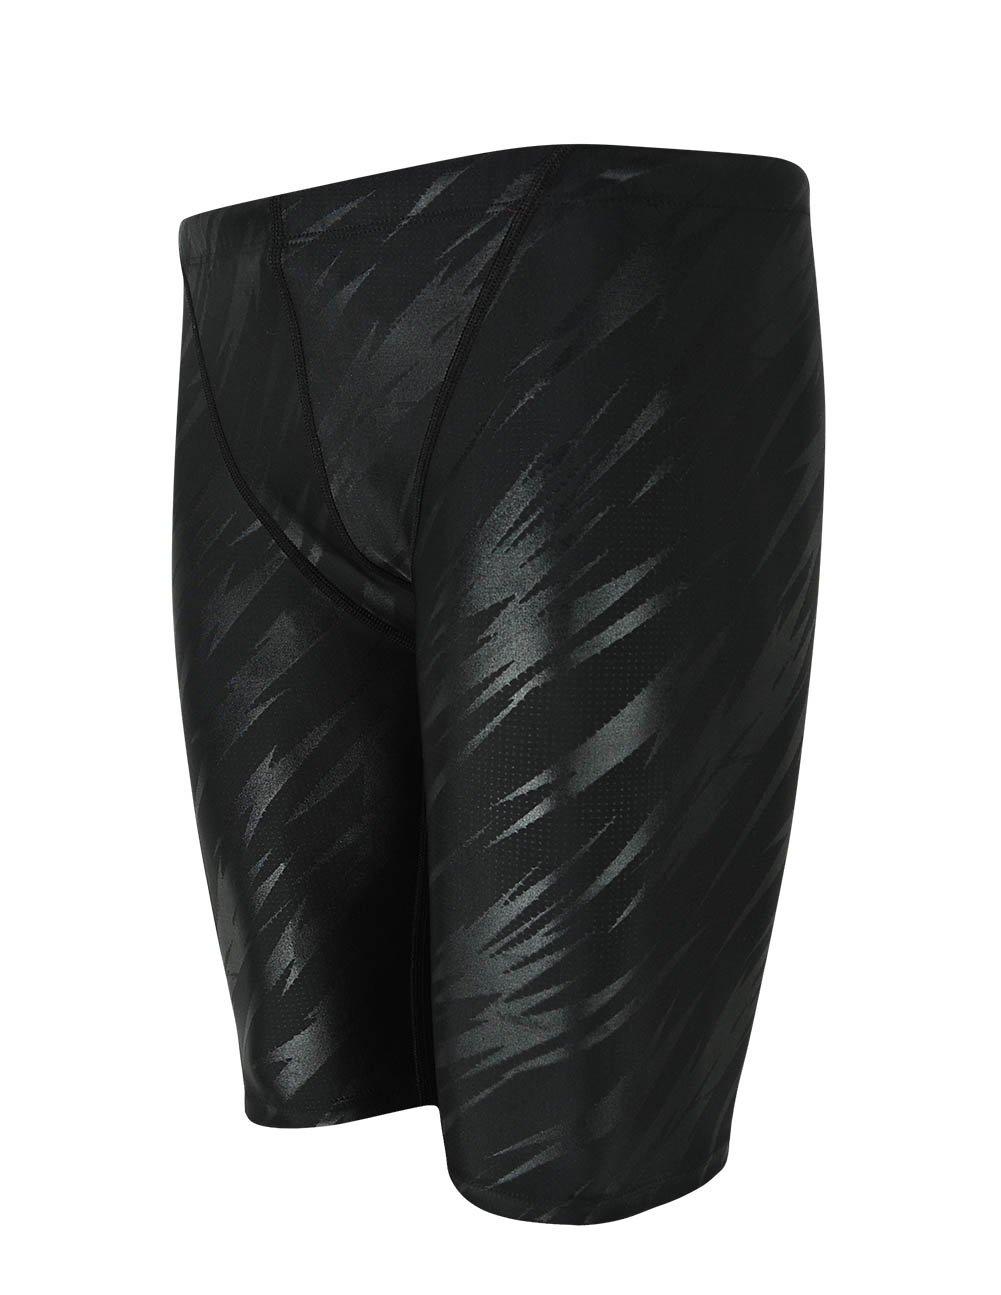 Srnfean Men`s Swimming Jammers Endurance+ Quick Dry Swimsuit Black Stripe Medium by Srnfean